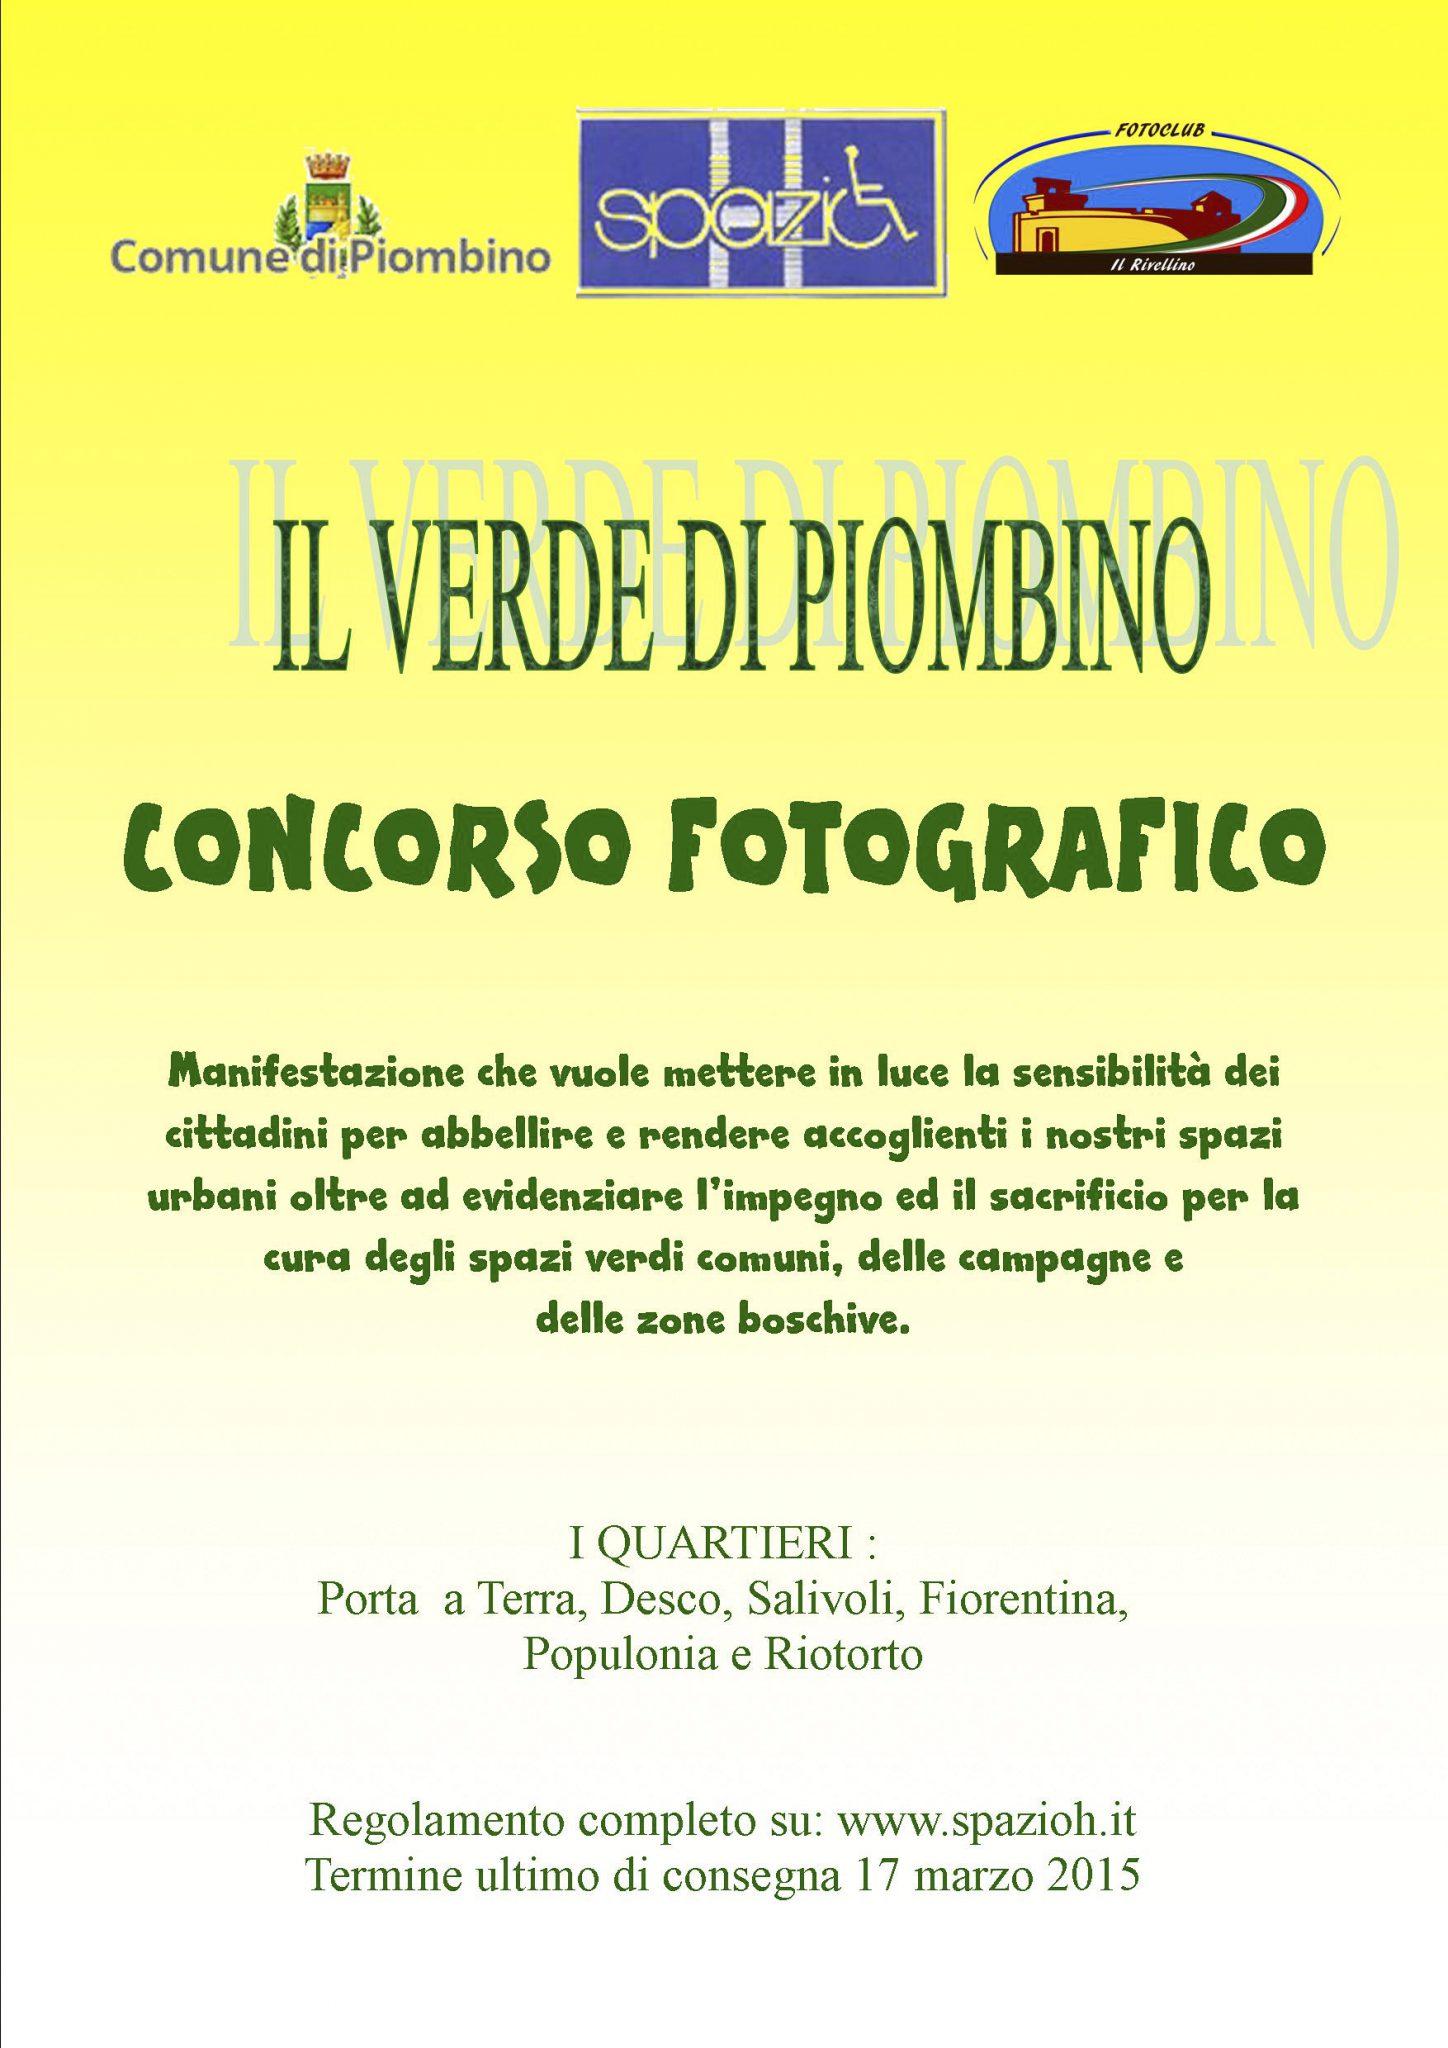 Locandina del concorso fotografico